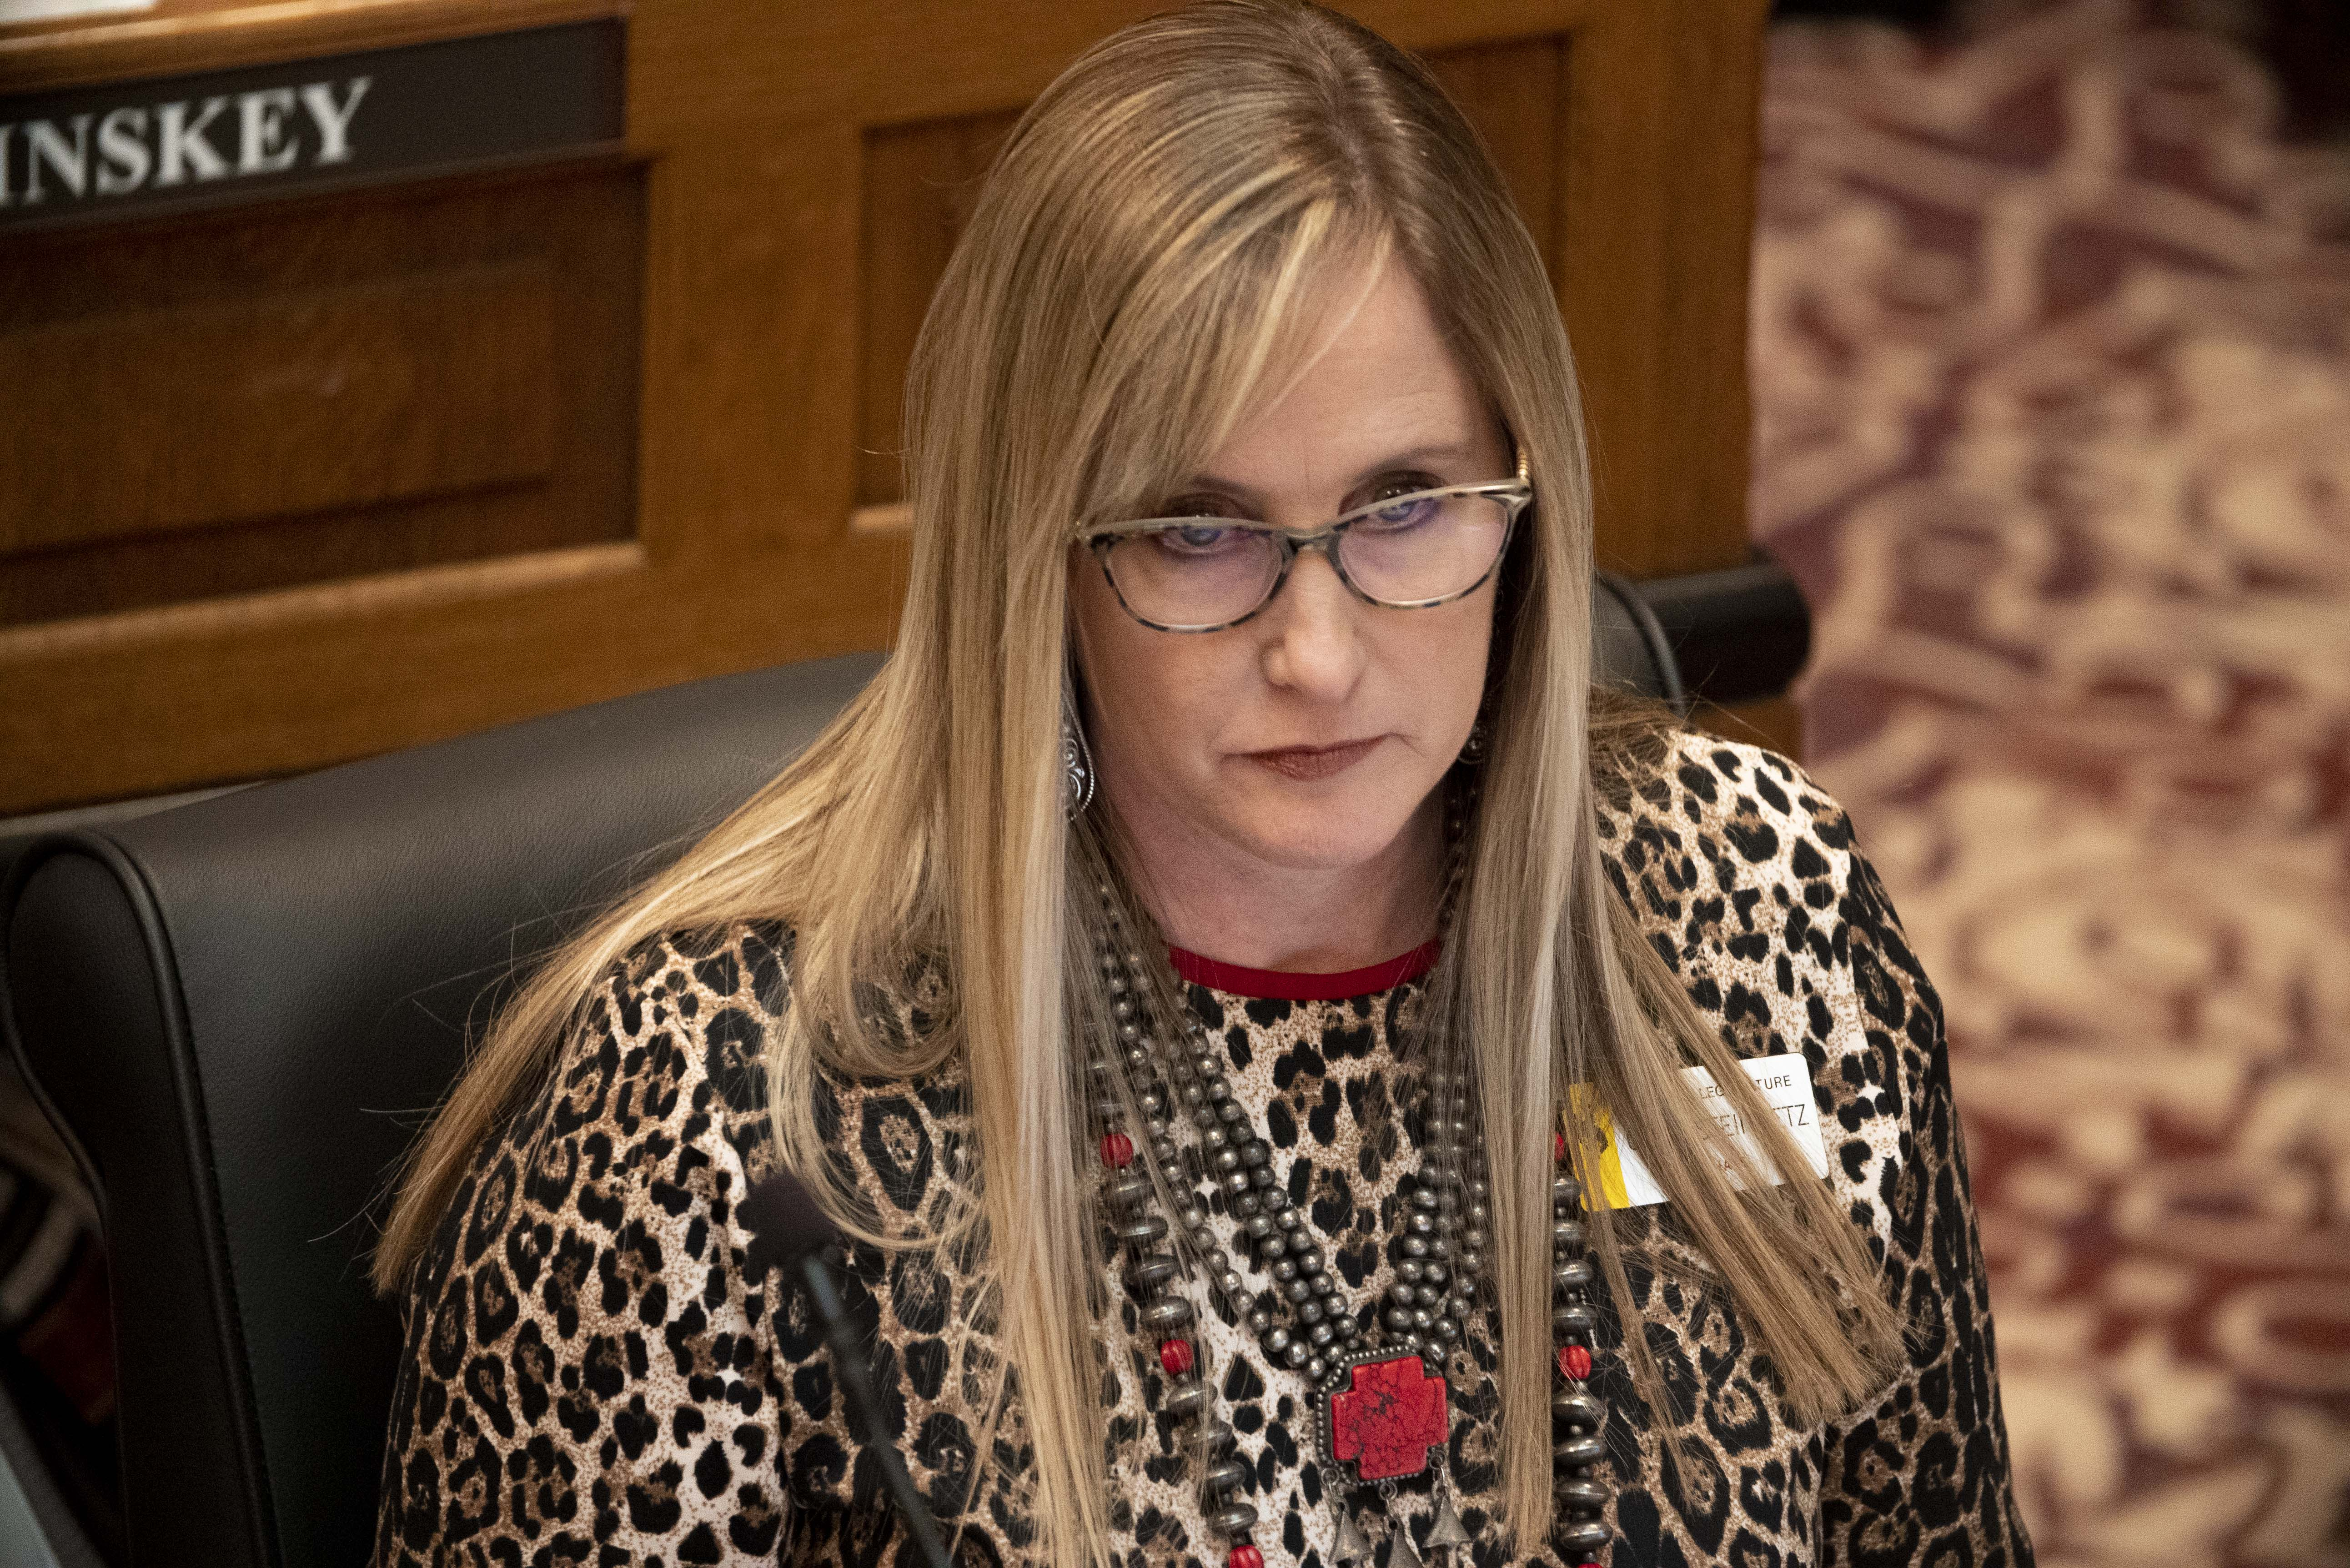 Bills bring national 'cancel culture' v. free speech debate to Wyo